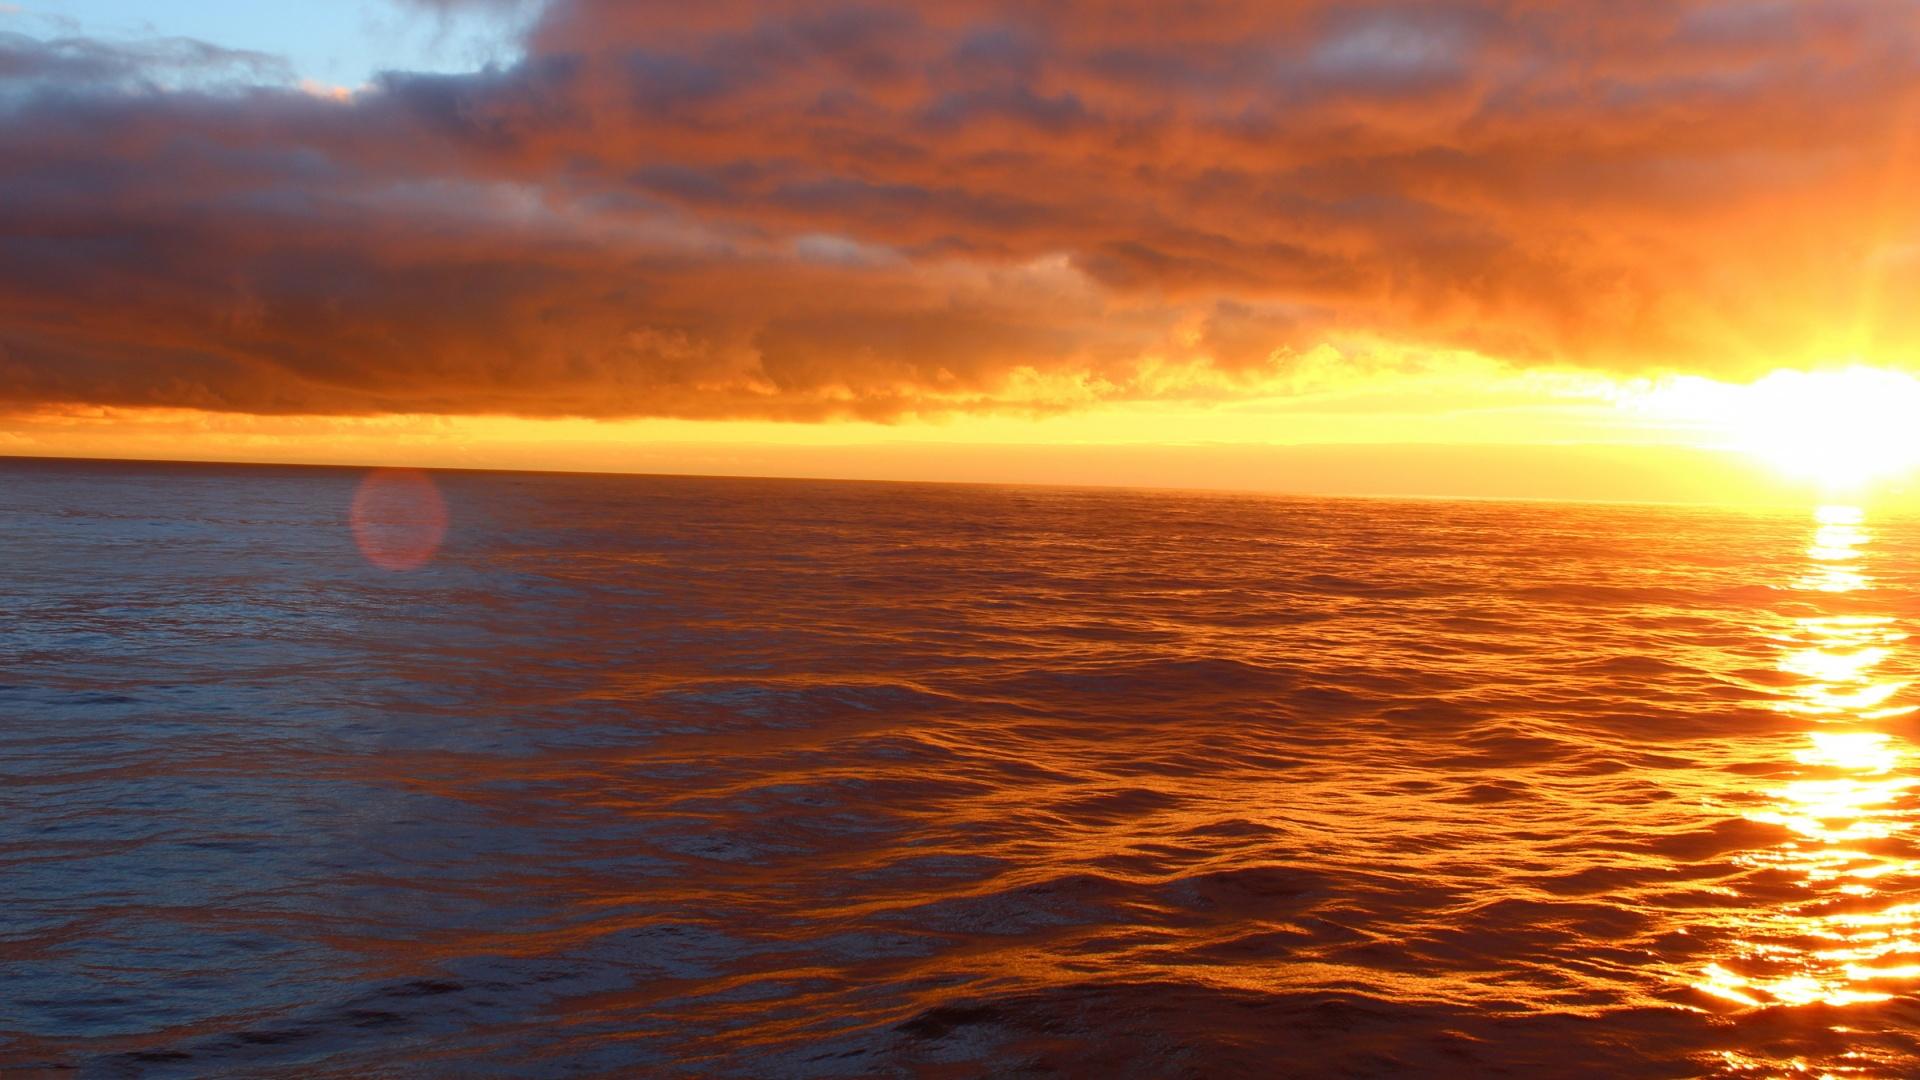 Sunset Ocean Wallpaper Sf Wallpaper